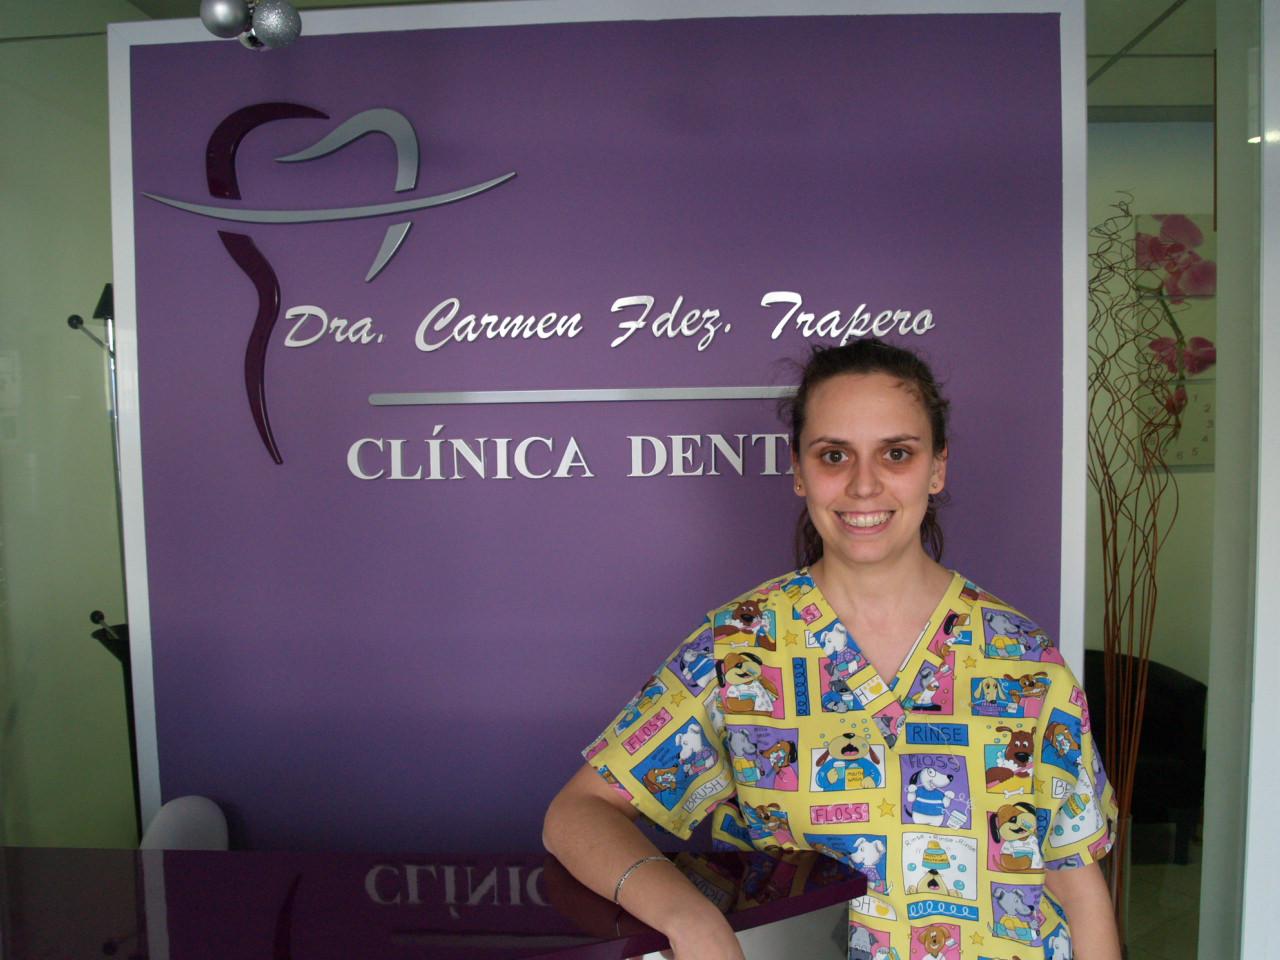 Clínica dental Carmen Fdez. Trapero de Pedro Muñoz